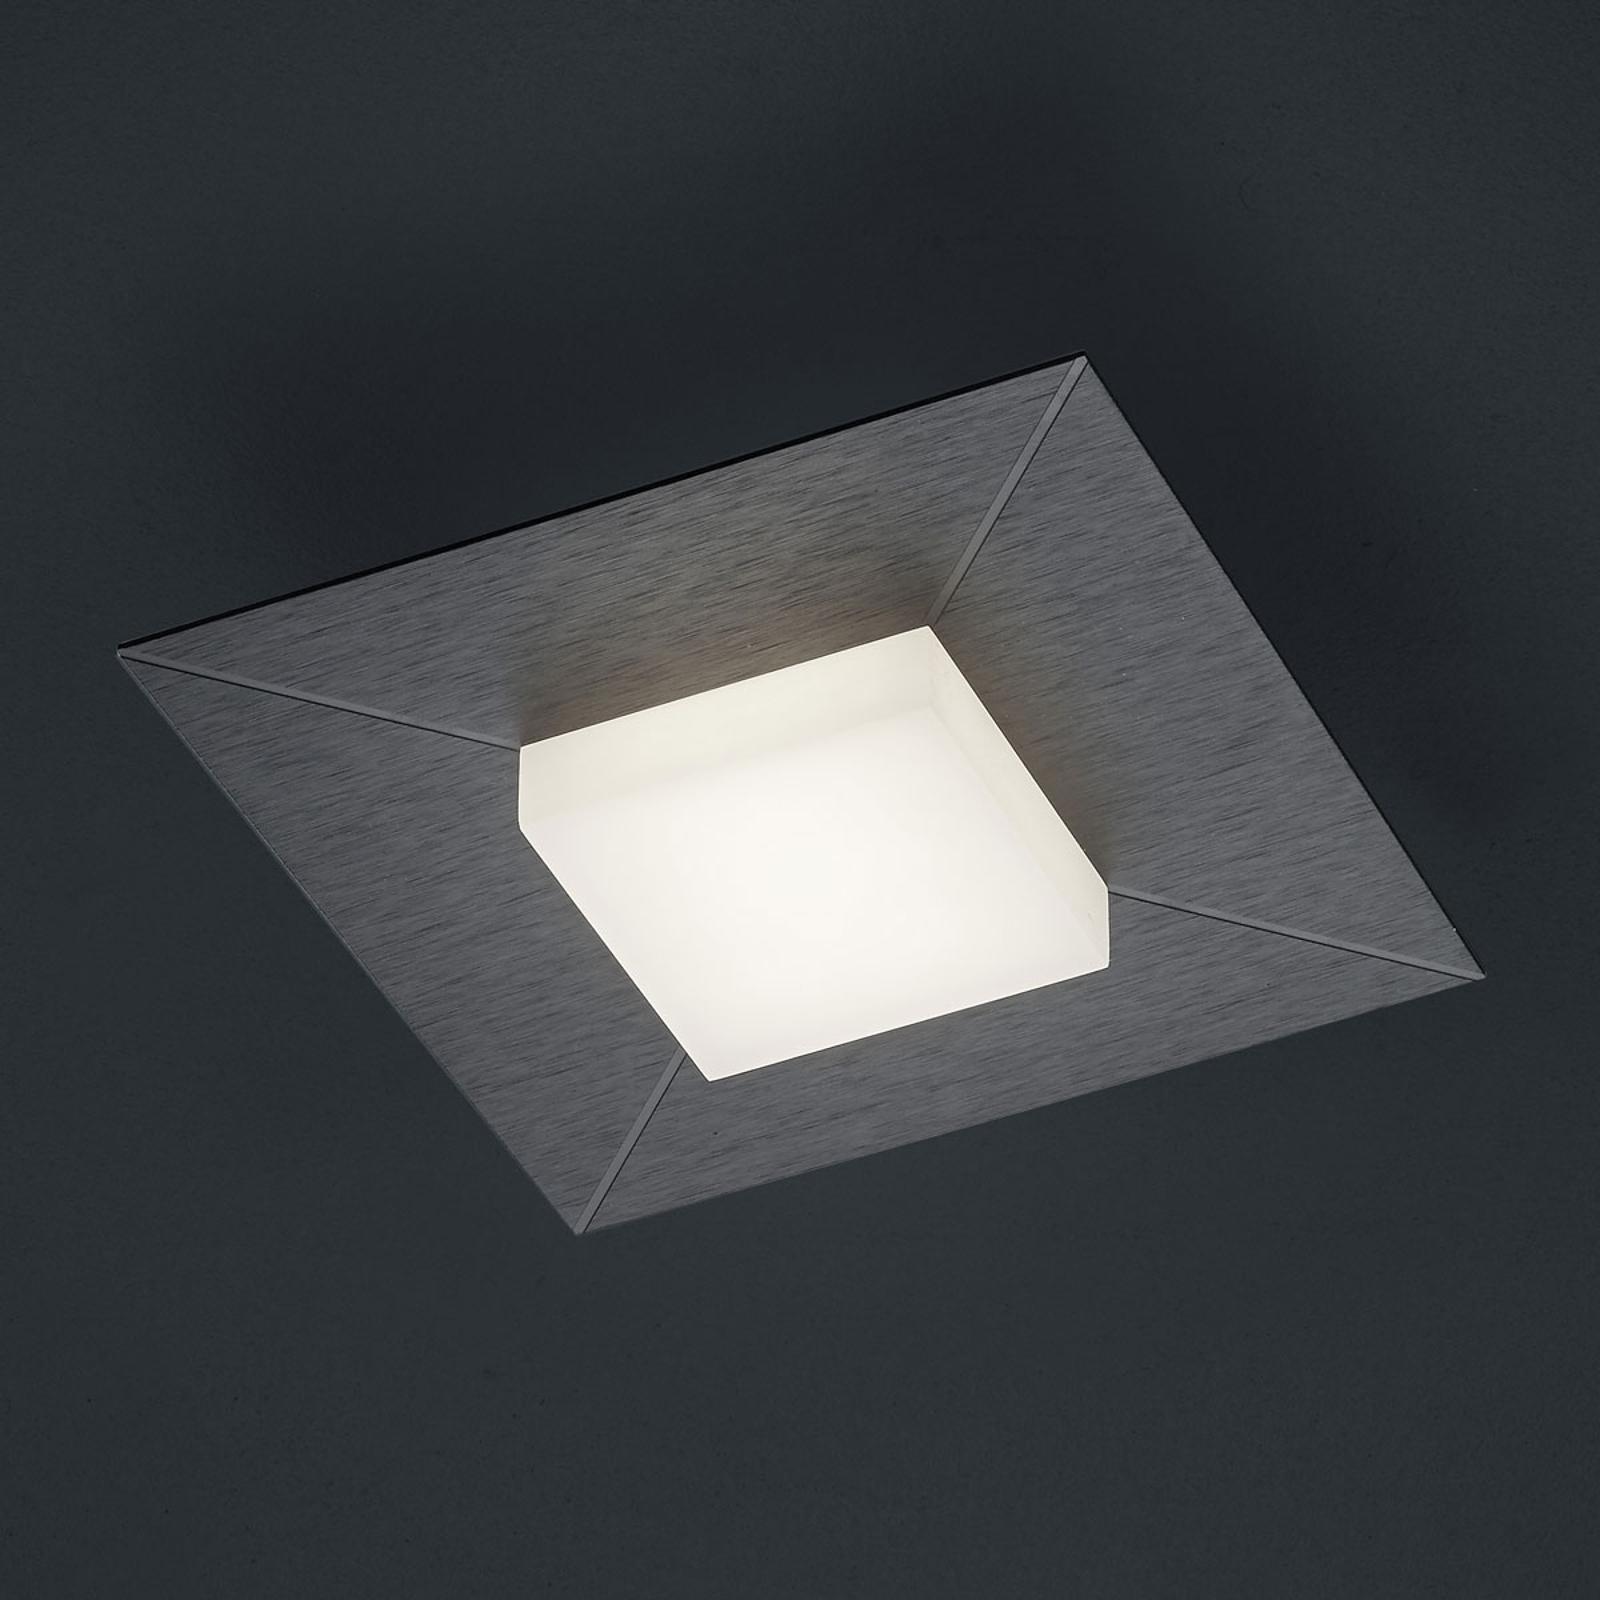 BANKAMP Diamond plafondlamp 17x17cm, antraciet